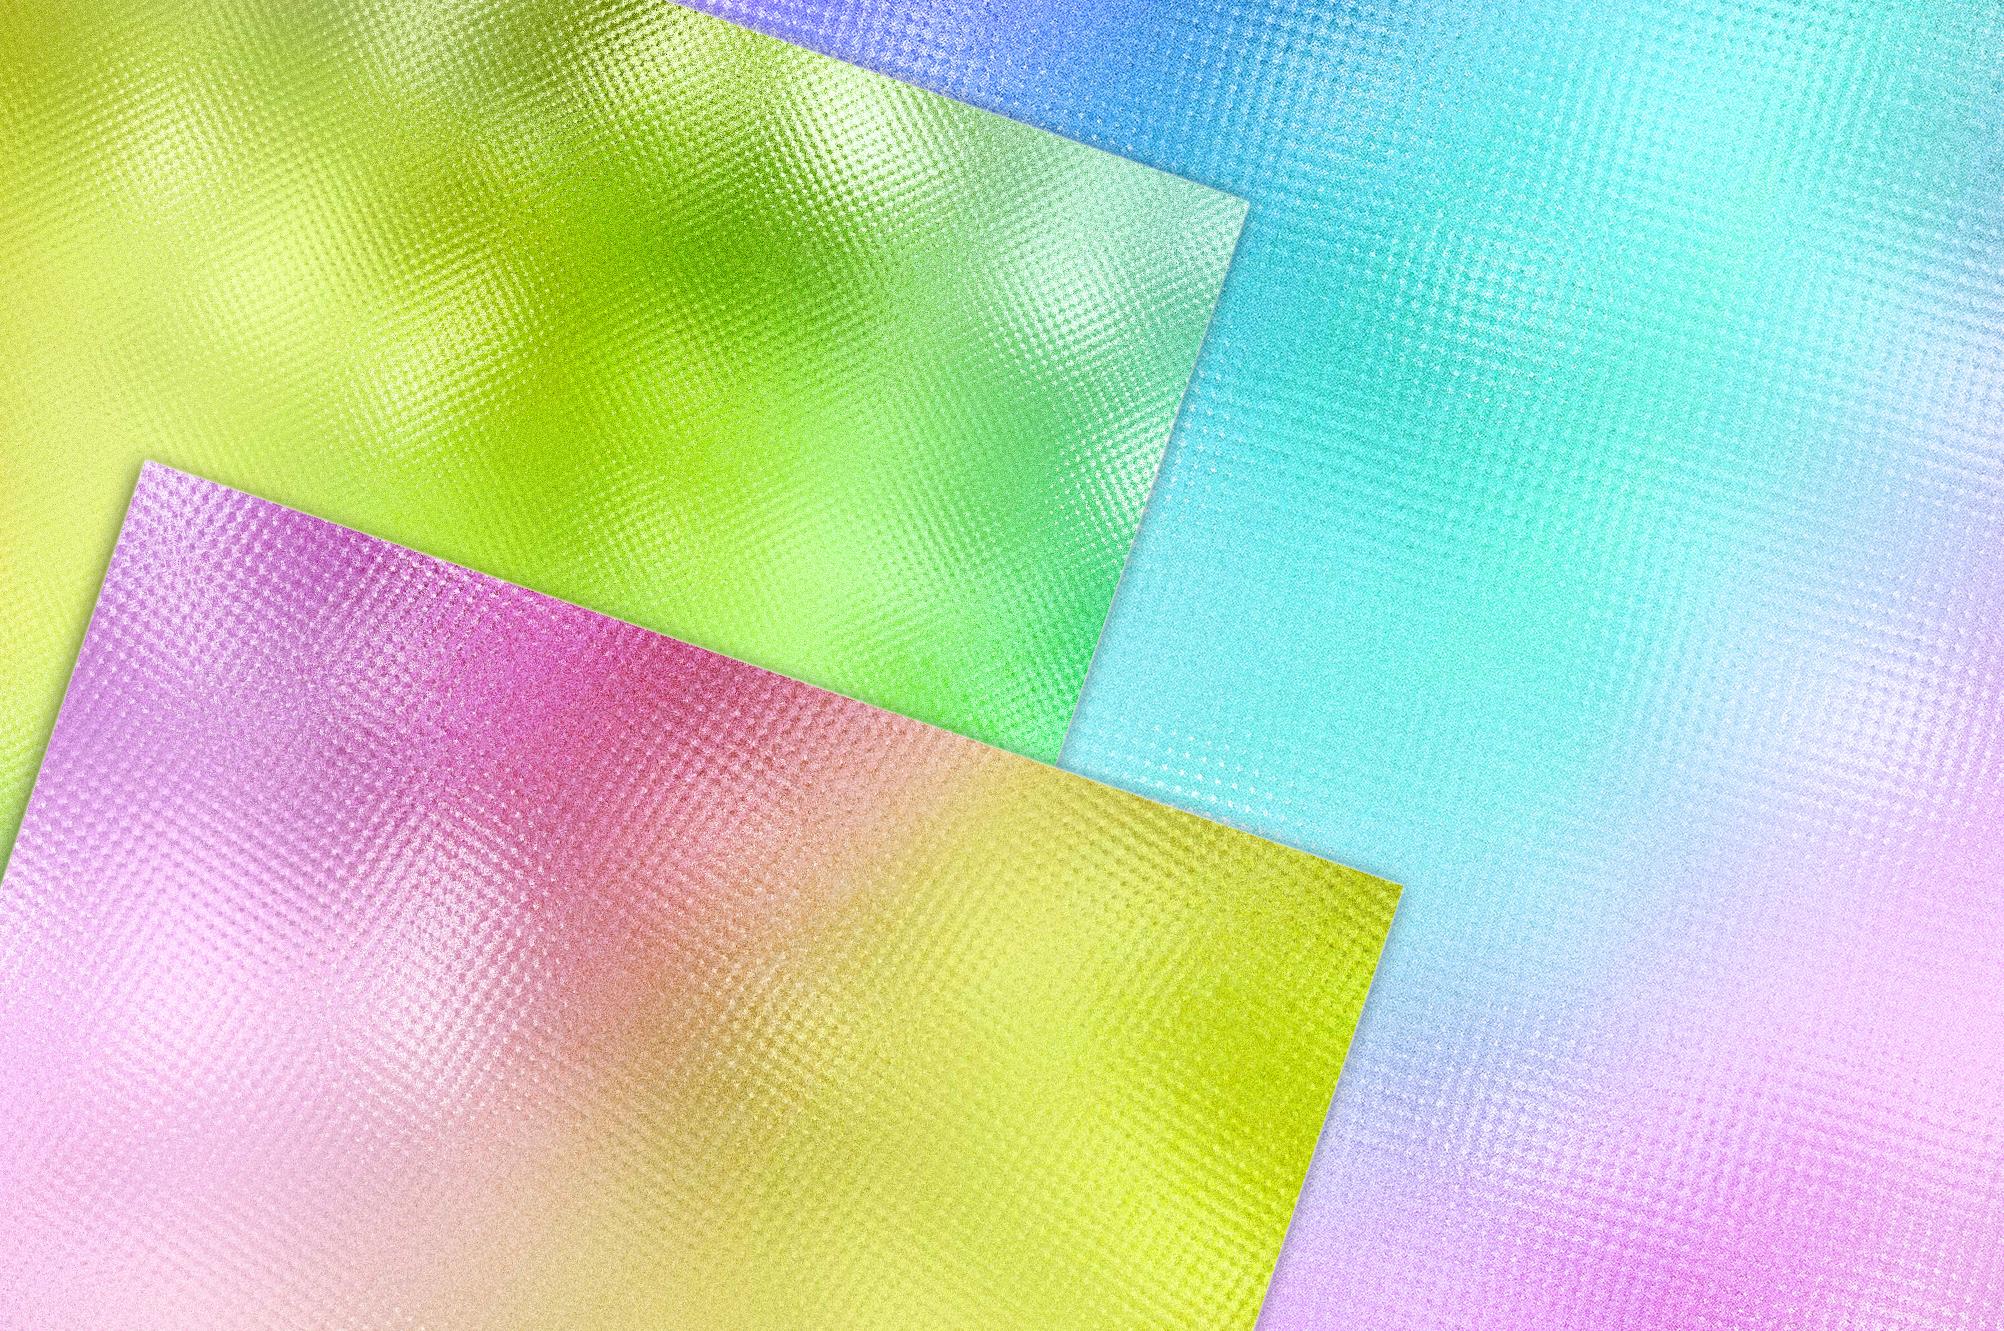 Iridescent Textures example image 2